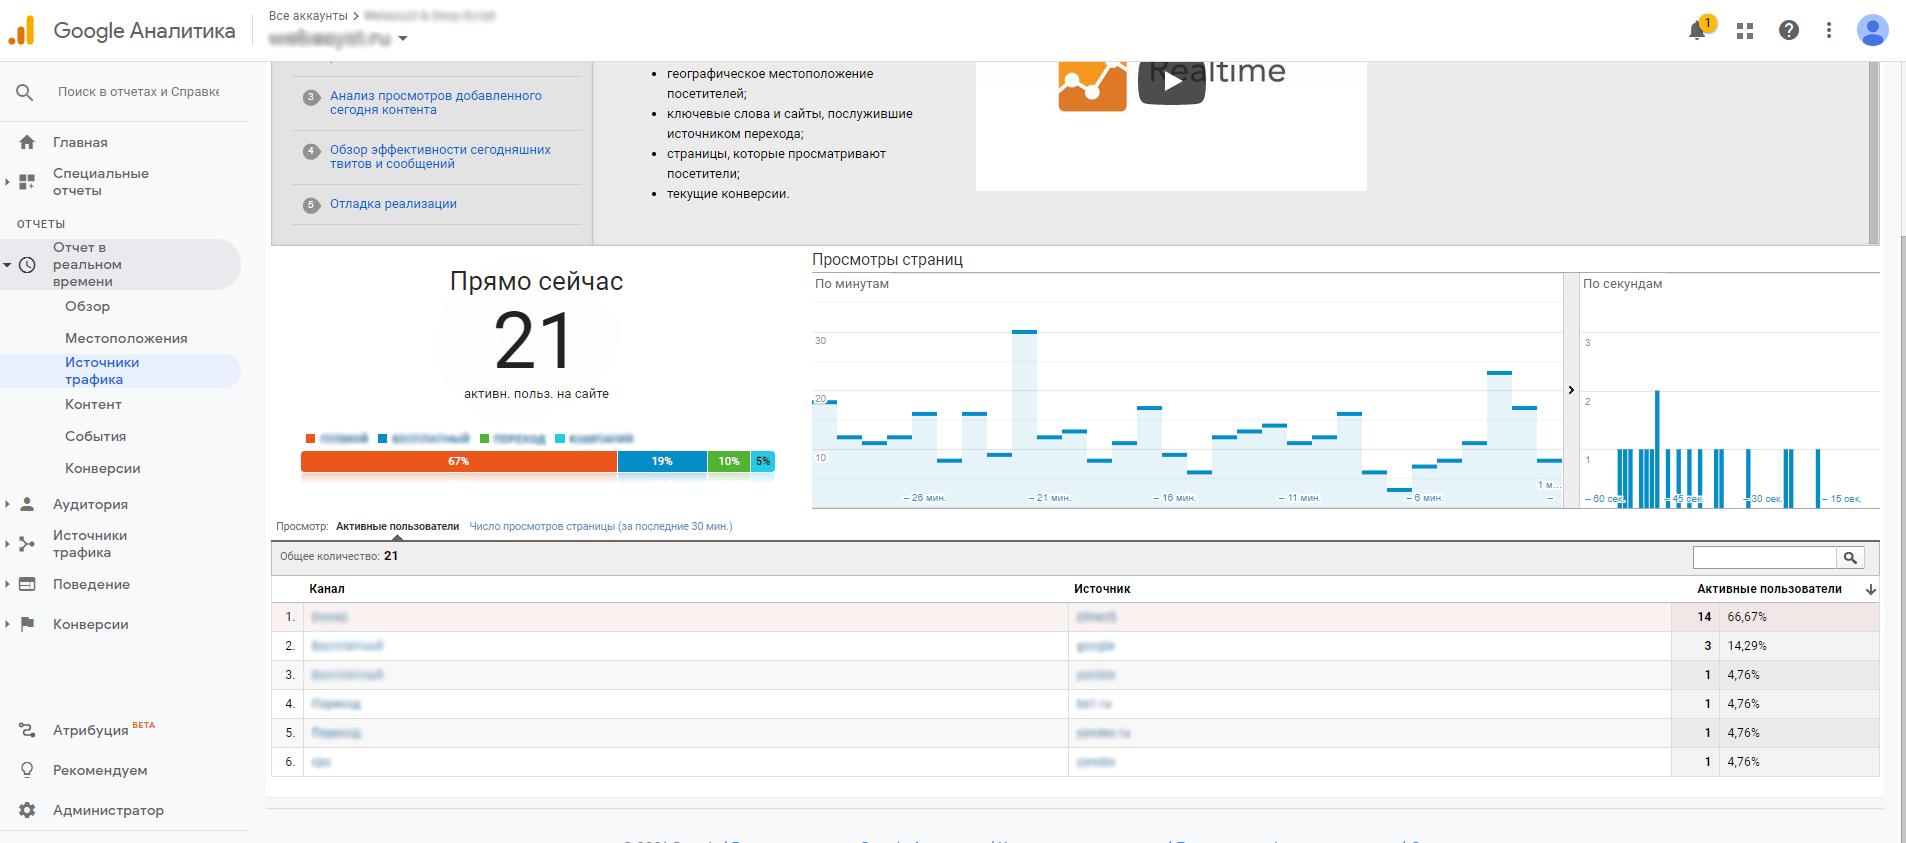 Отчет по источникам трафика Google Analytics